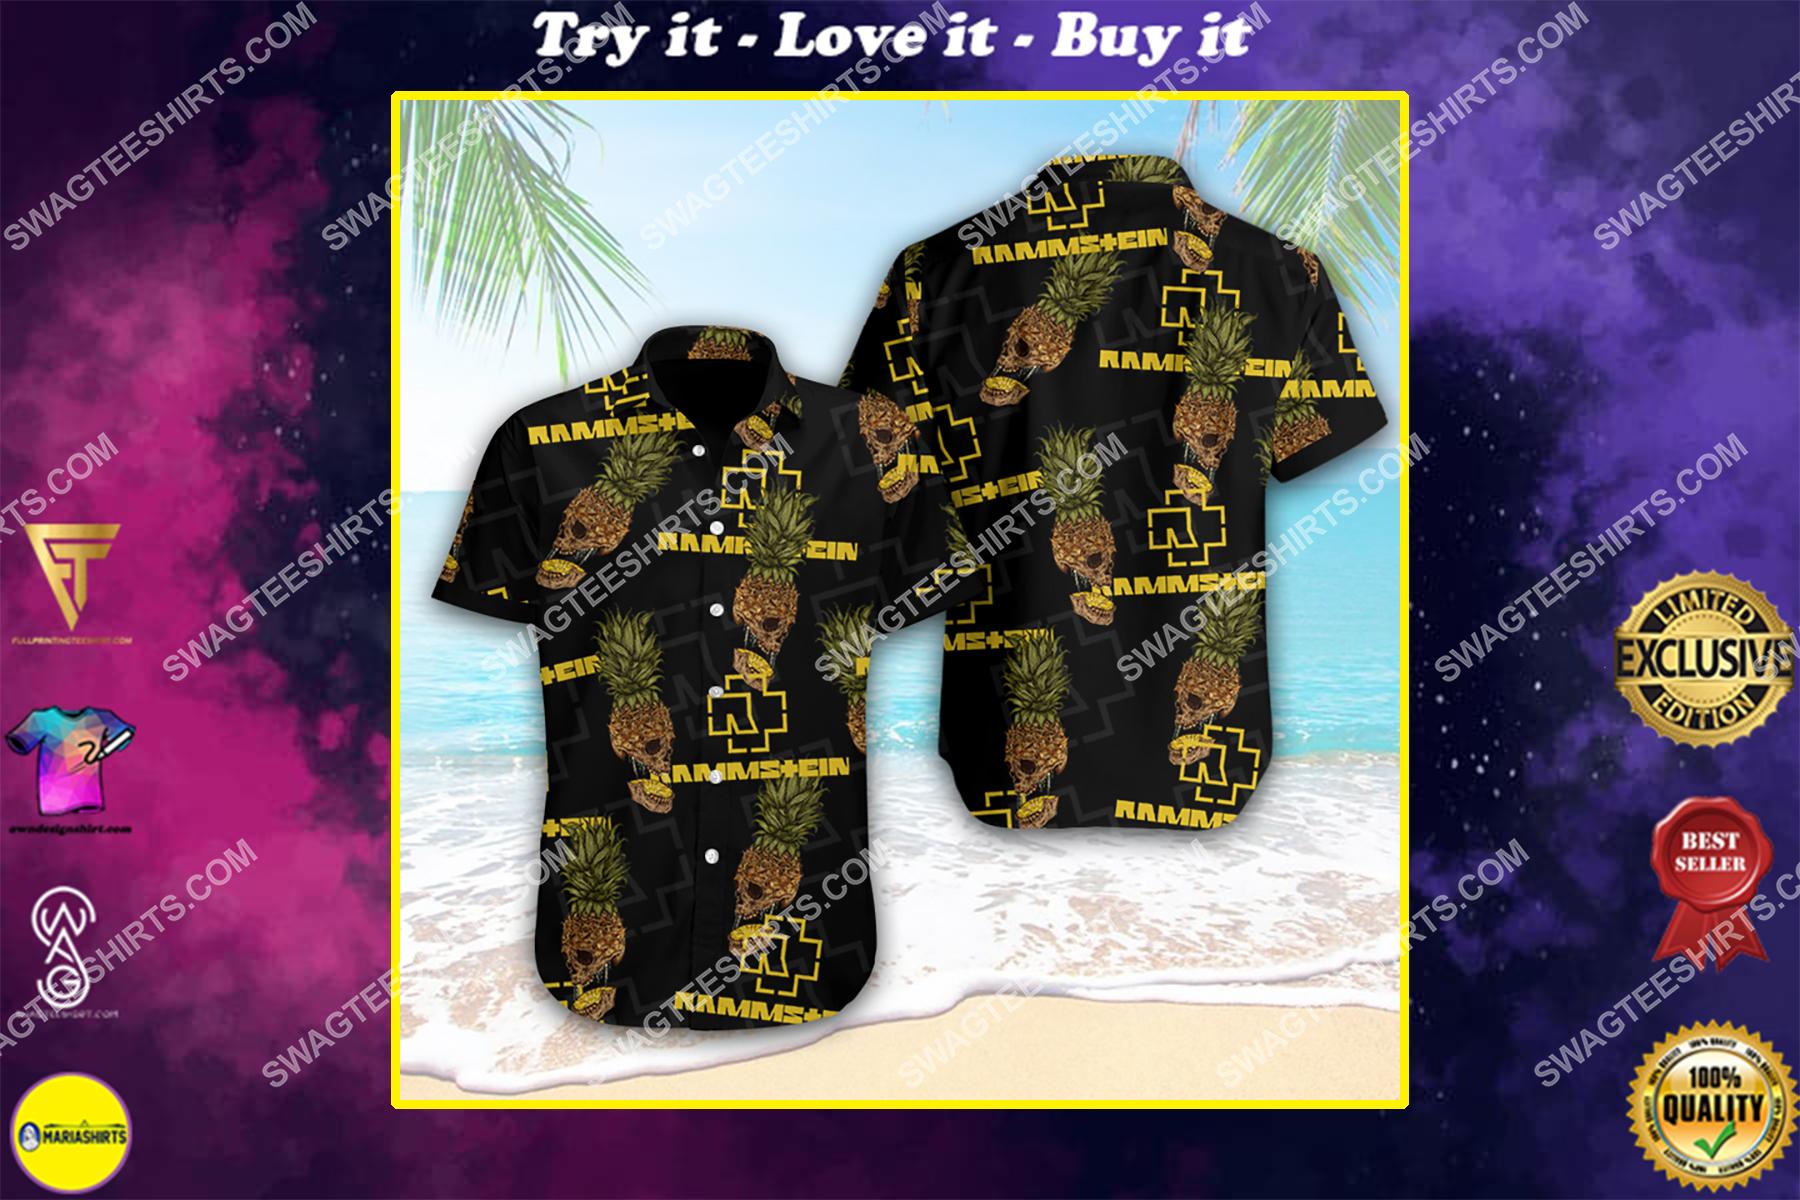 the rammstein band full printing hawaiian shirt